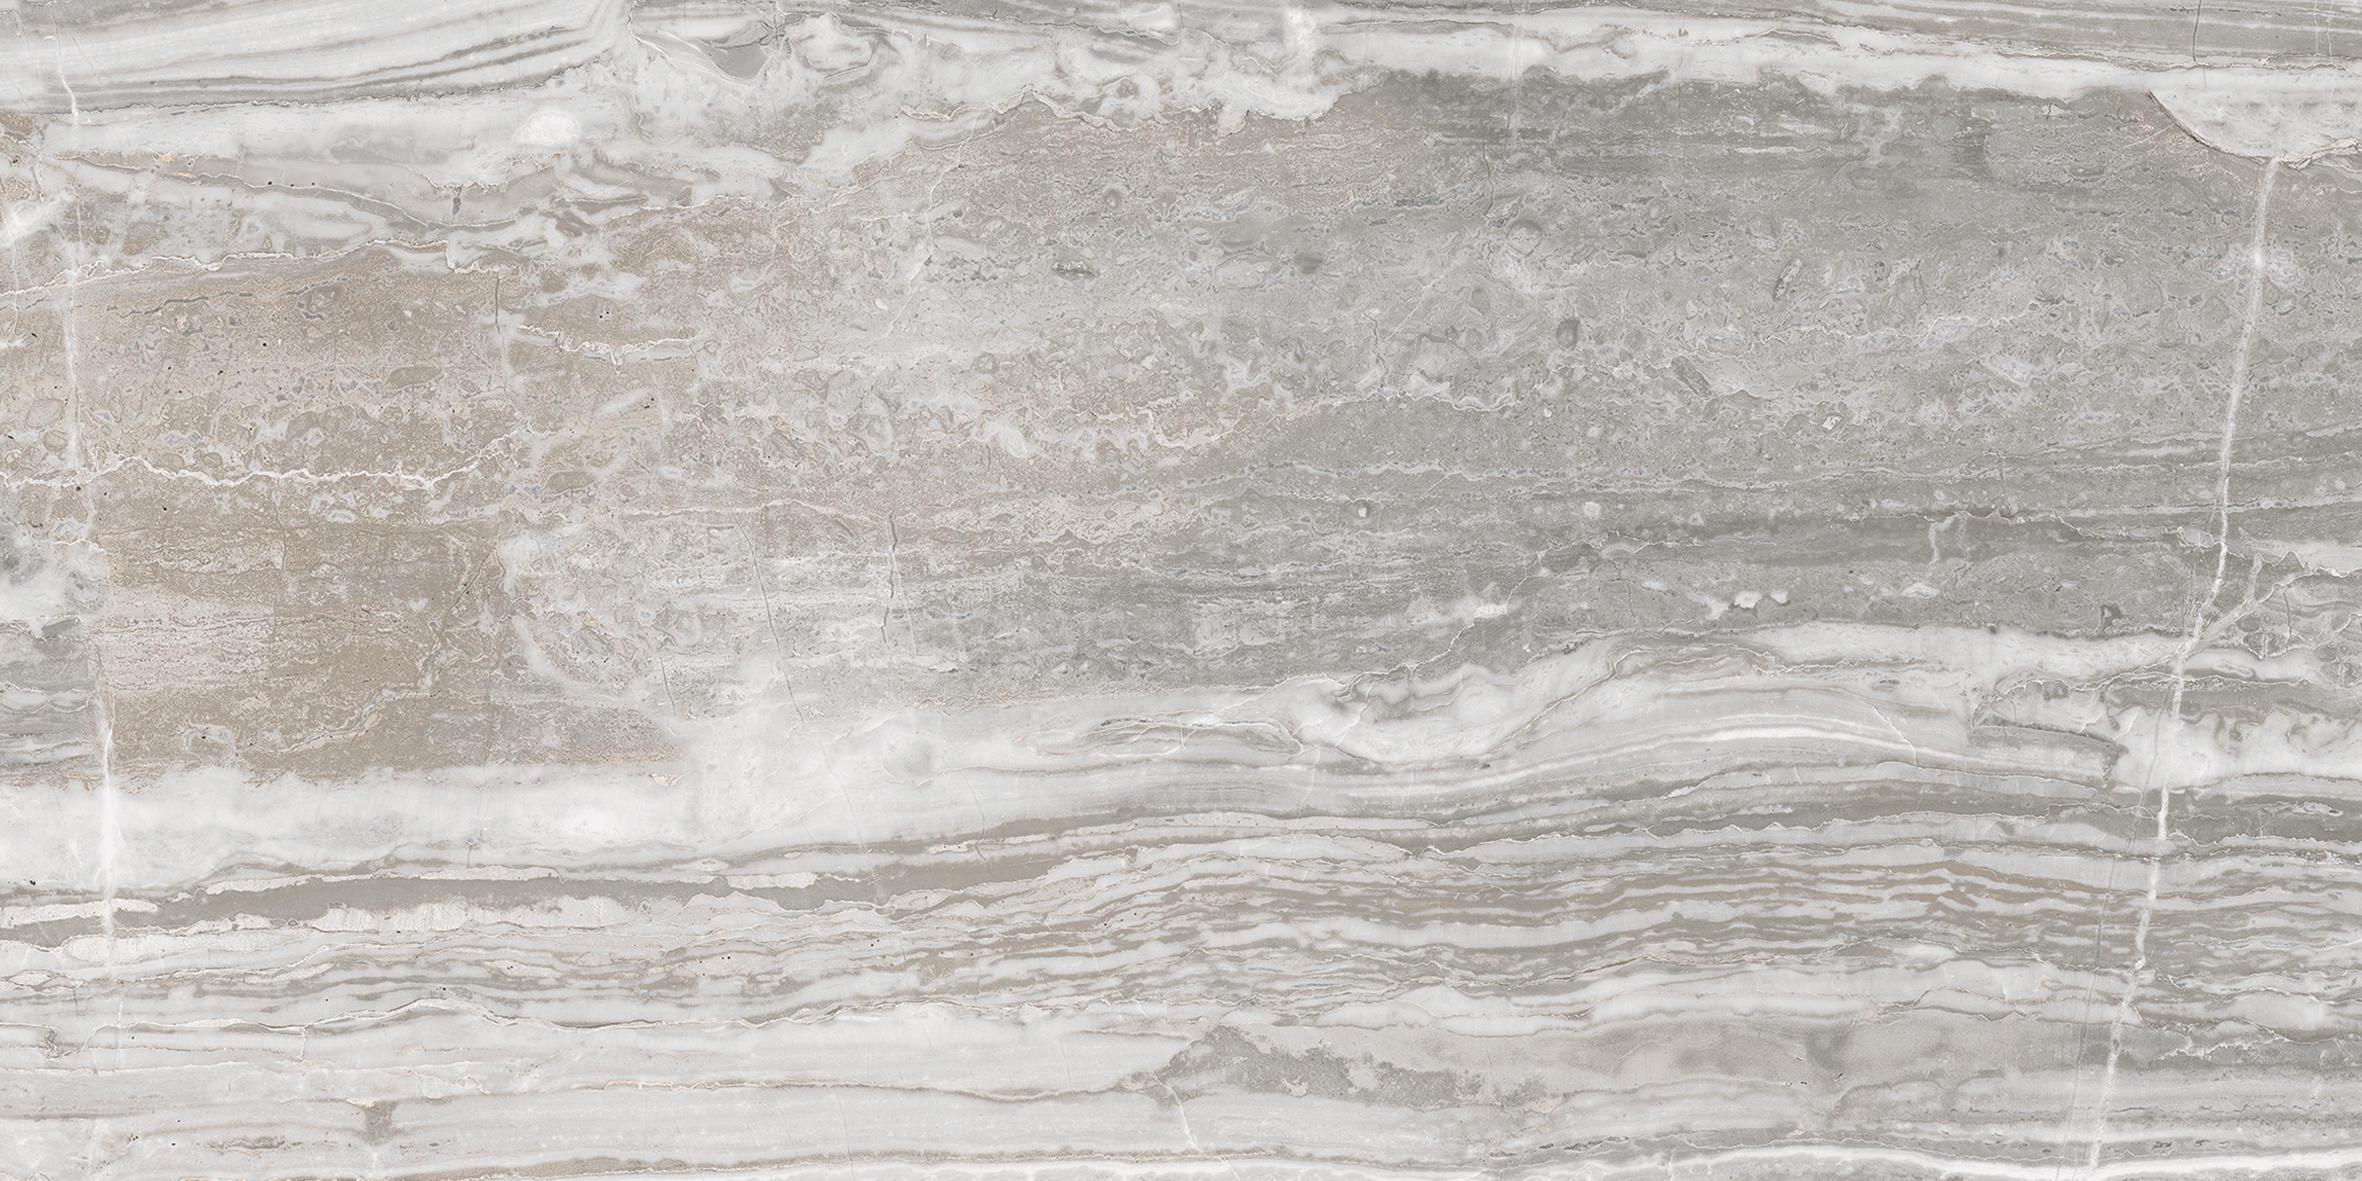 Sensi arabesque silver floor tiles from abk group architonic sensi arabesque silver by abk group floor tiles dailygadgetfo Image collections